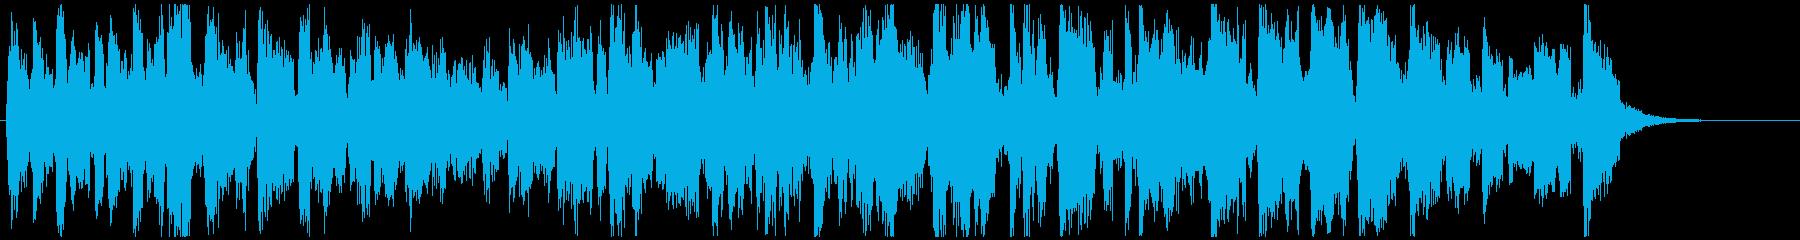 CM向け15秒ジャズ■せわしないビバップの再生済みの波形